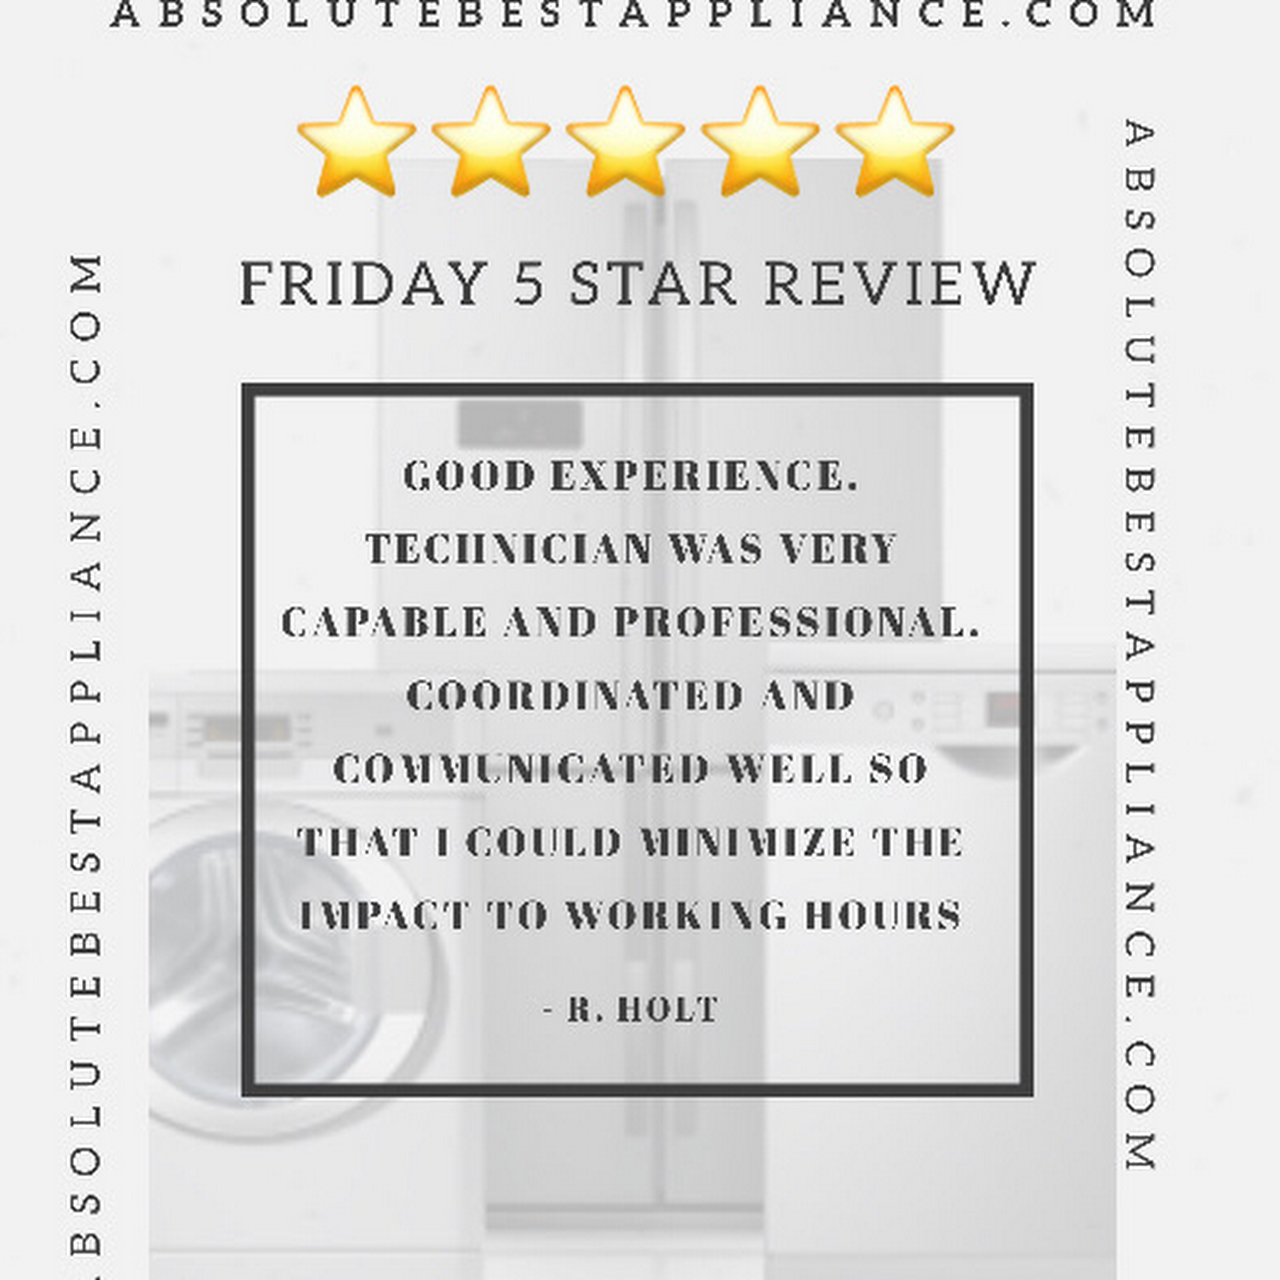 Absolute Best Appliance Appliance Repair Service In